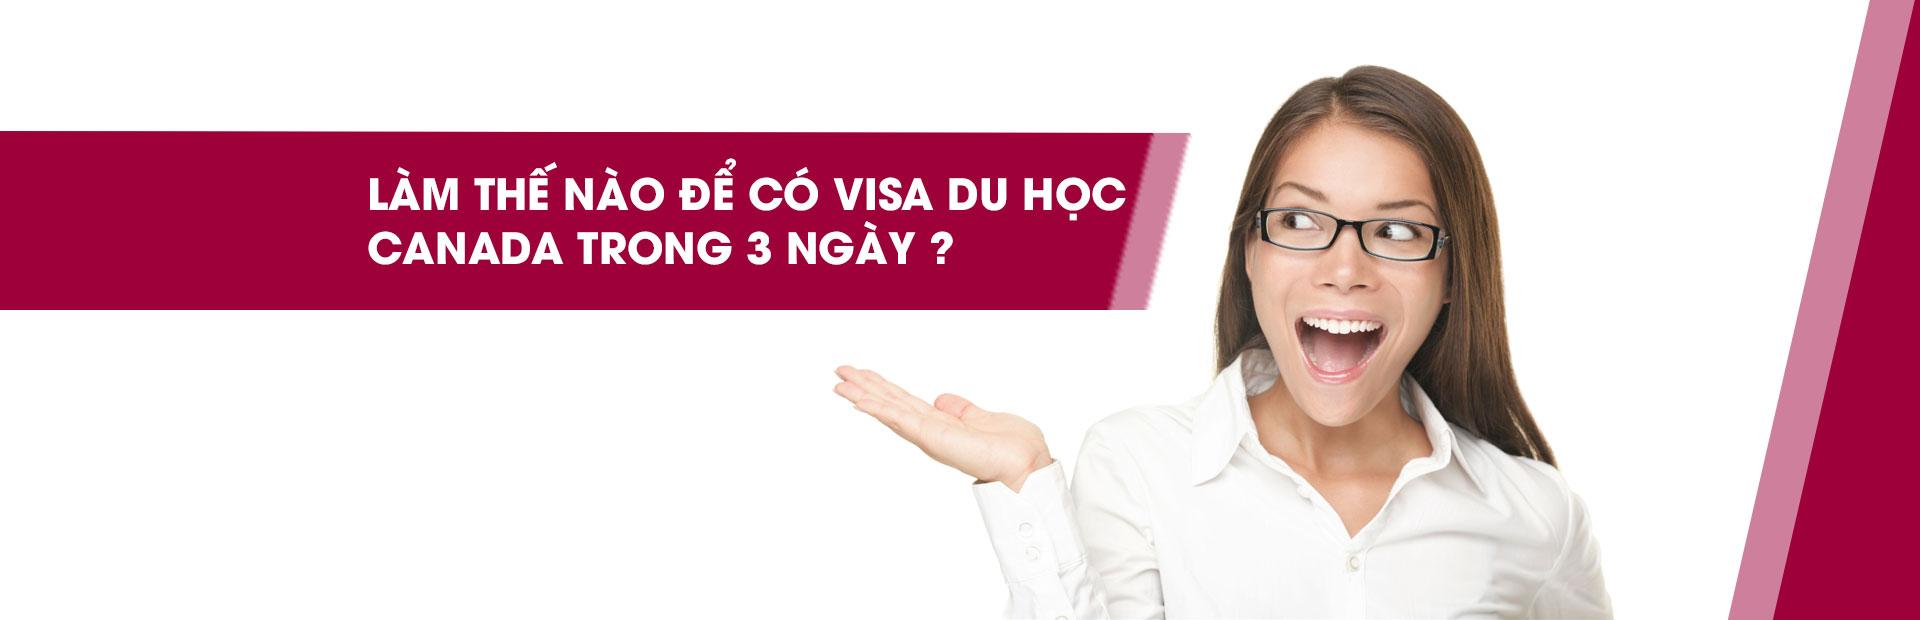 http://duhocinec.com/du-hoc-canada-khong-chung-minh-tai-chinh-chuong-trinh-canada-express-study-cua-lanh-su-quan